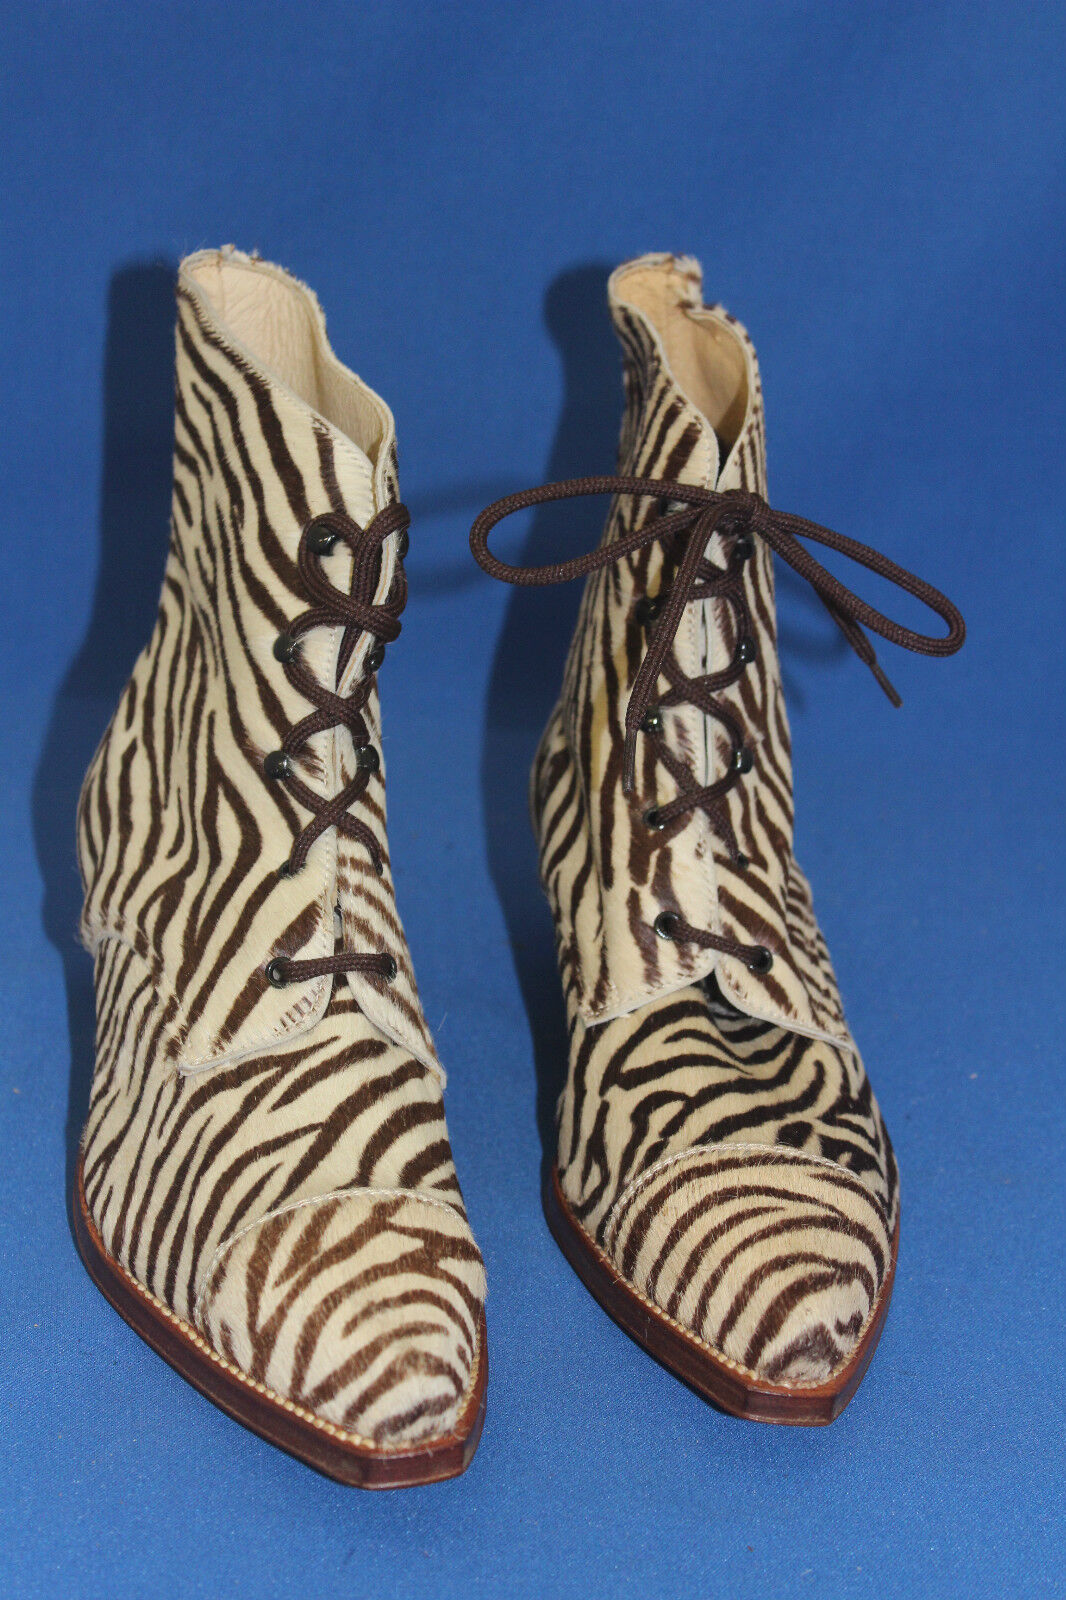 Prime Stiefelette westernstiefel Boots cowboyboots gr. 38 38 38 zebra fell pony leder b9afc8